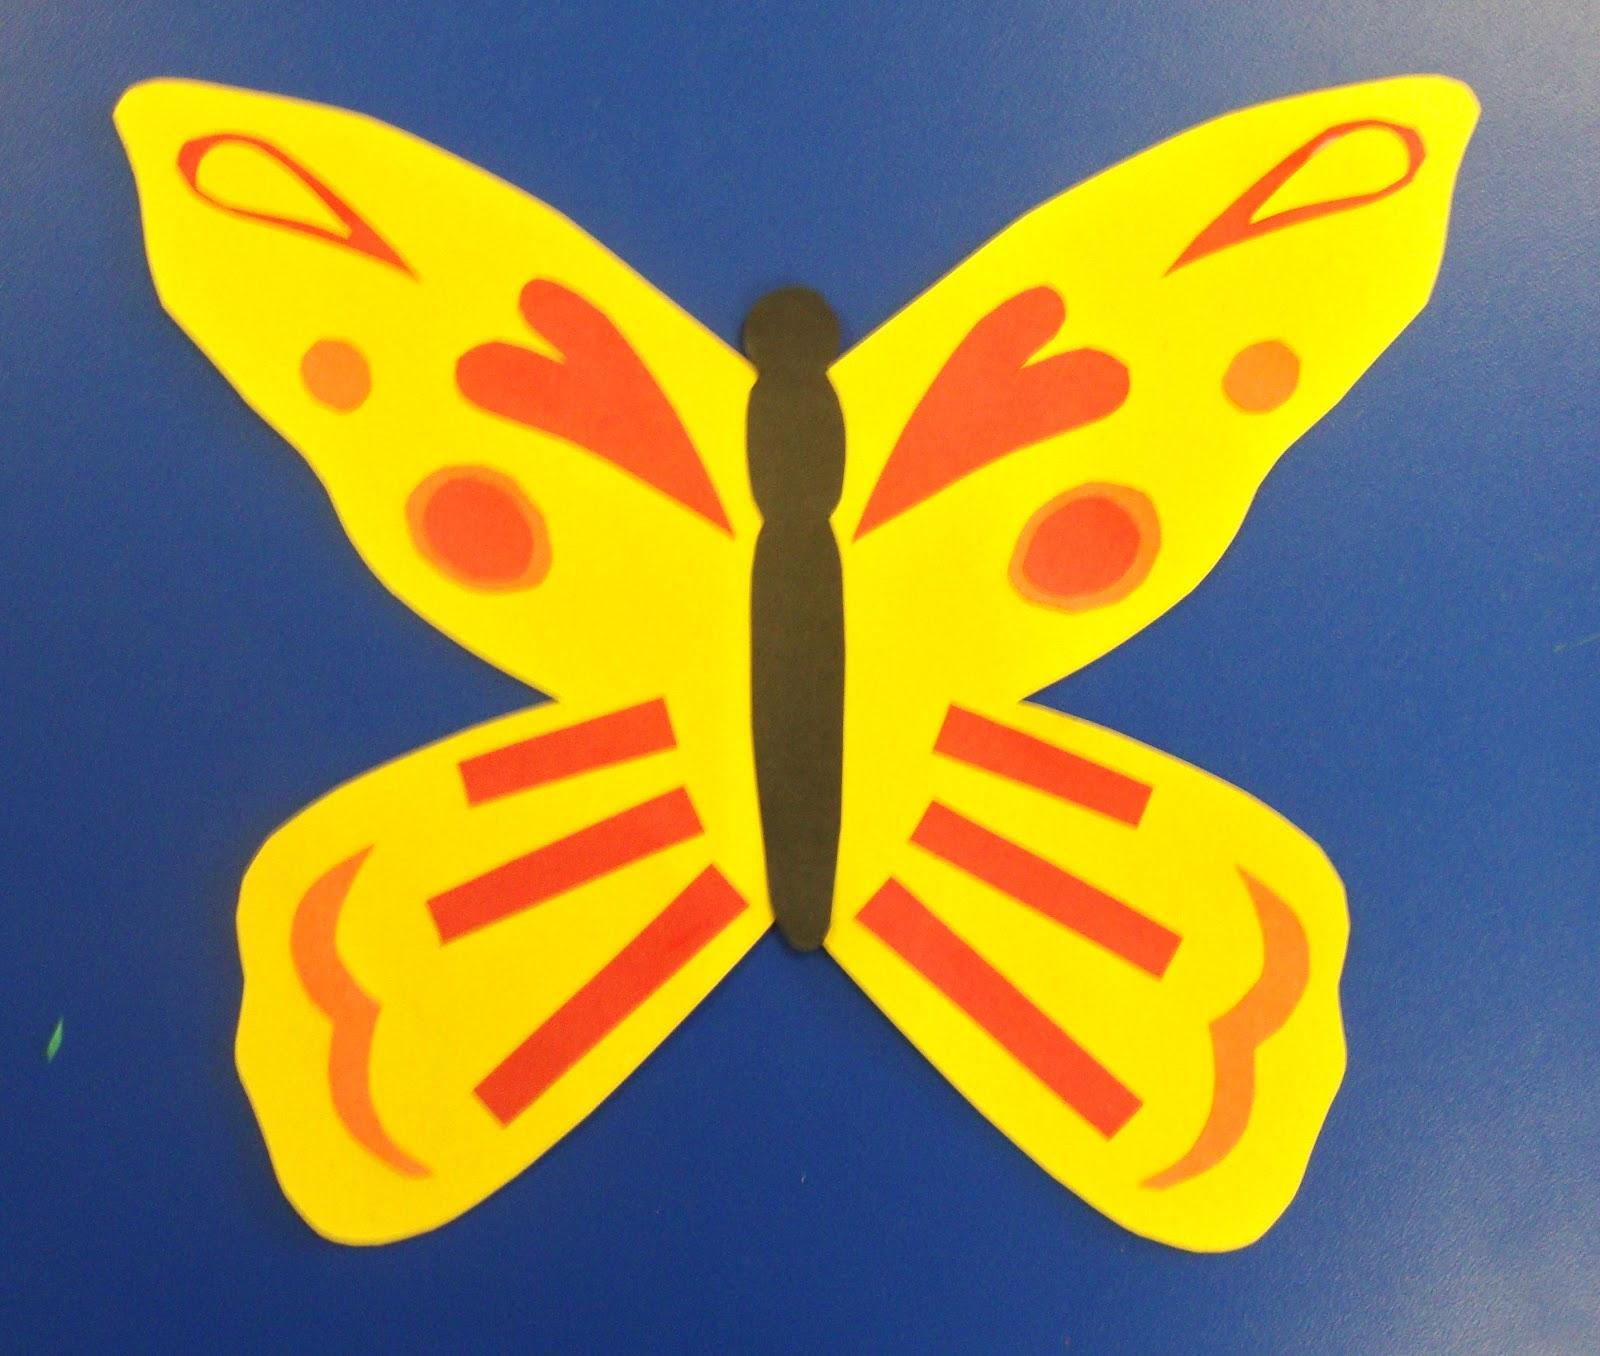 art paper scissors glue color theory butterflies